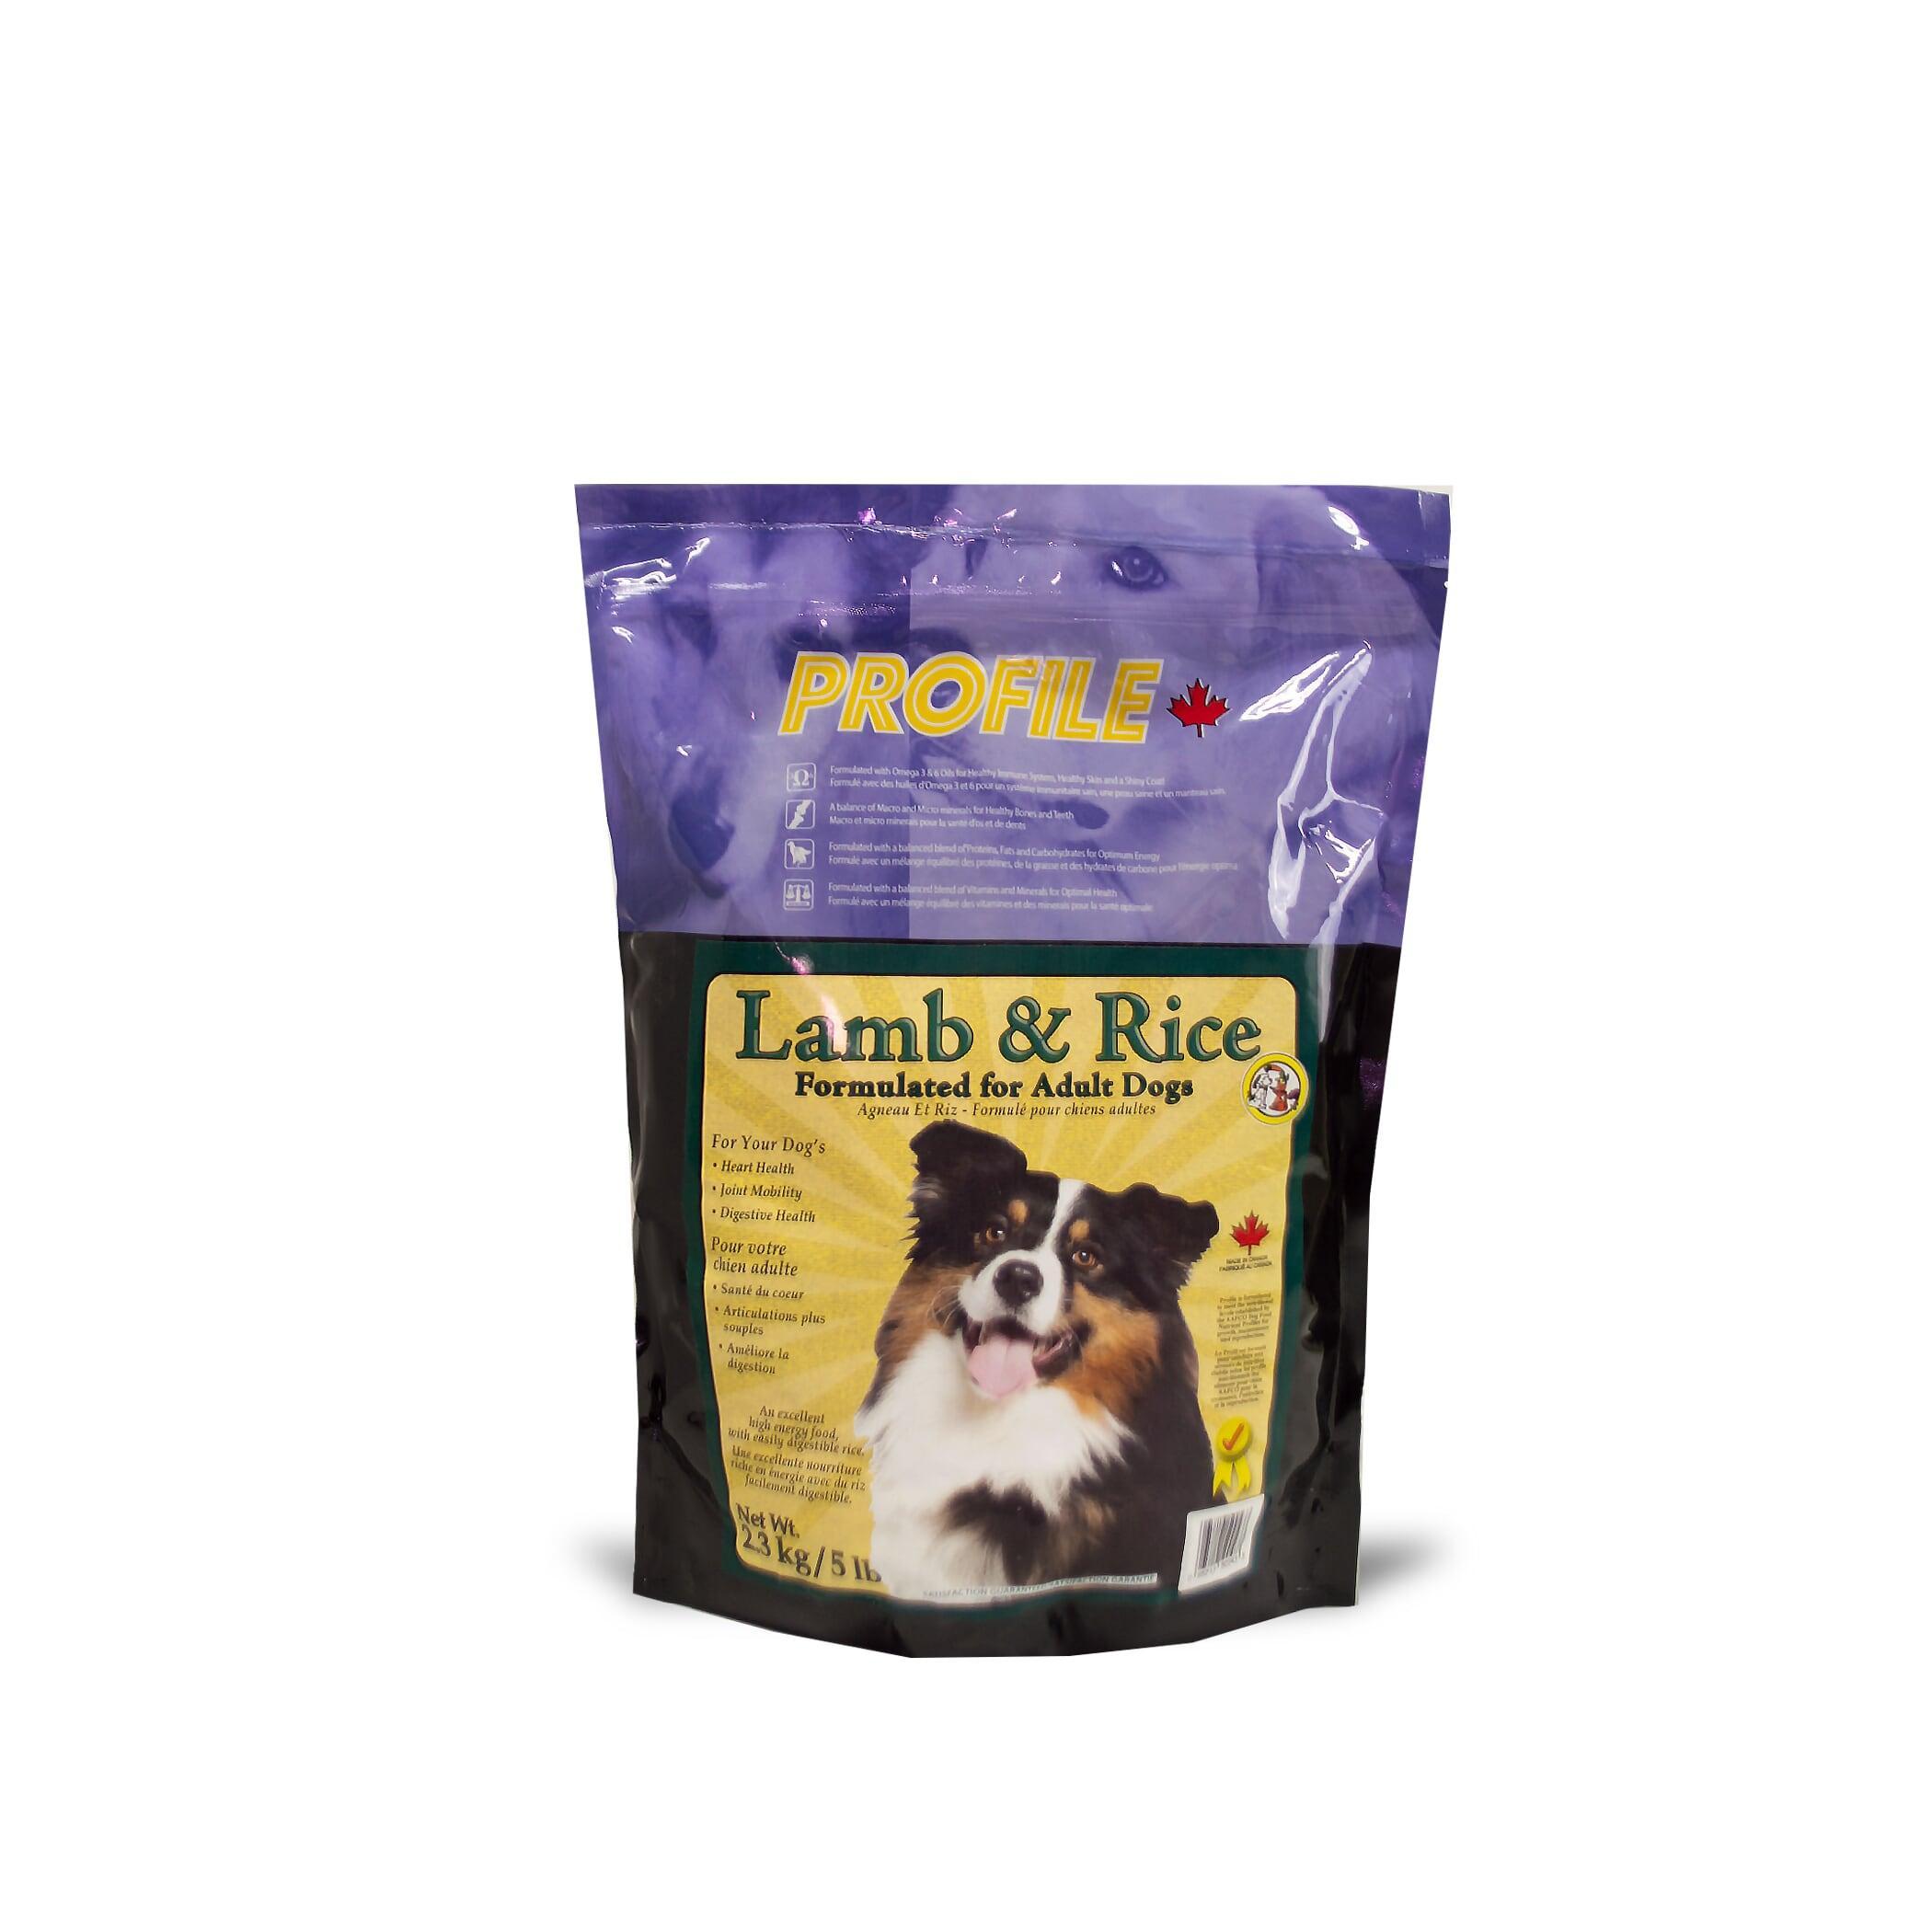 Profile Lamb & Rice Dry Dog Food, 2.3-kg